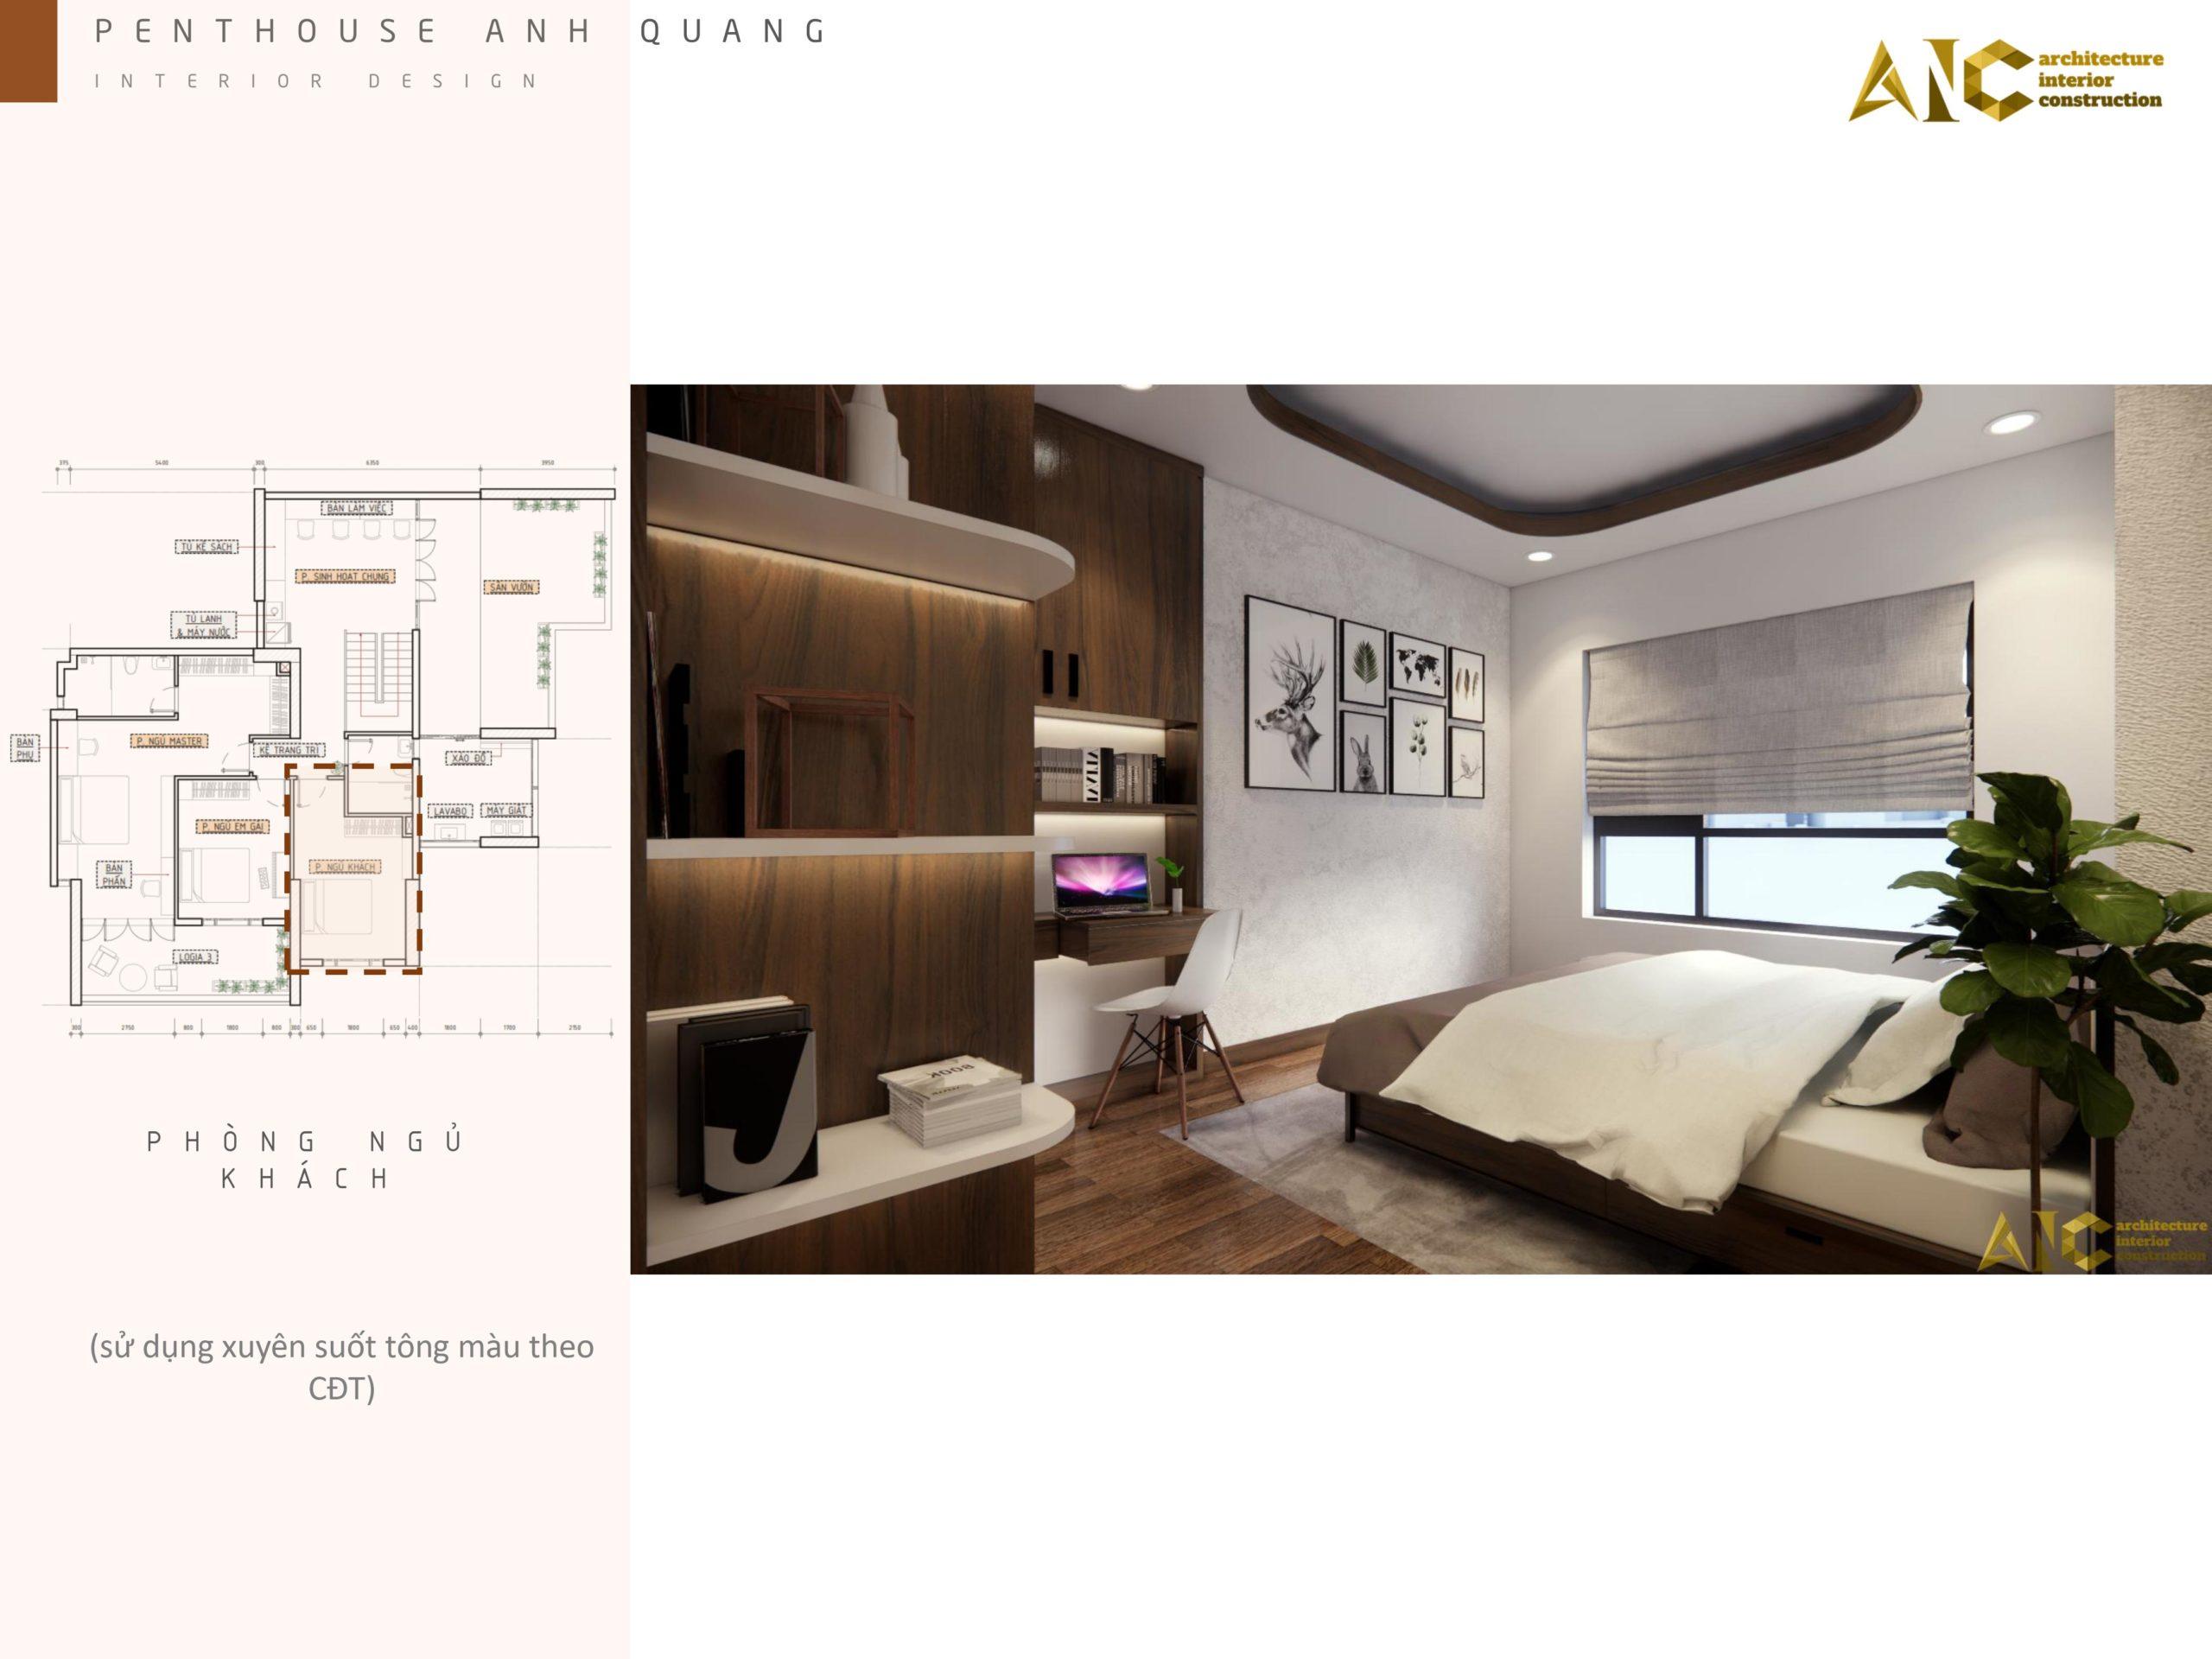 Penthouse-Anh-Quang-AIC-JSC-0072